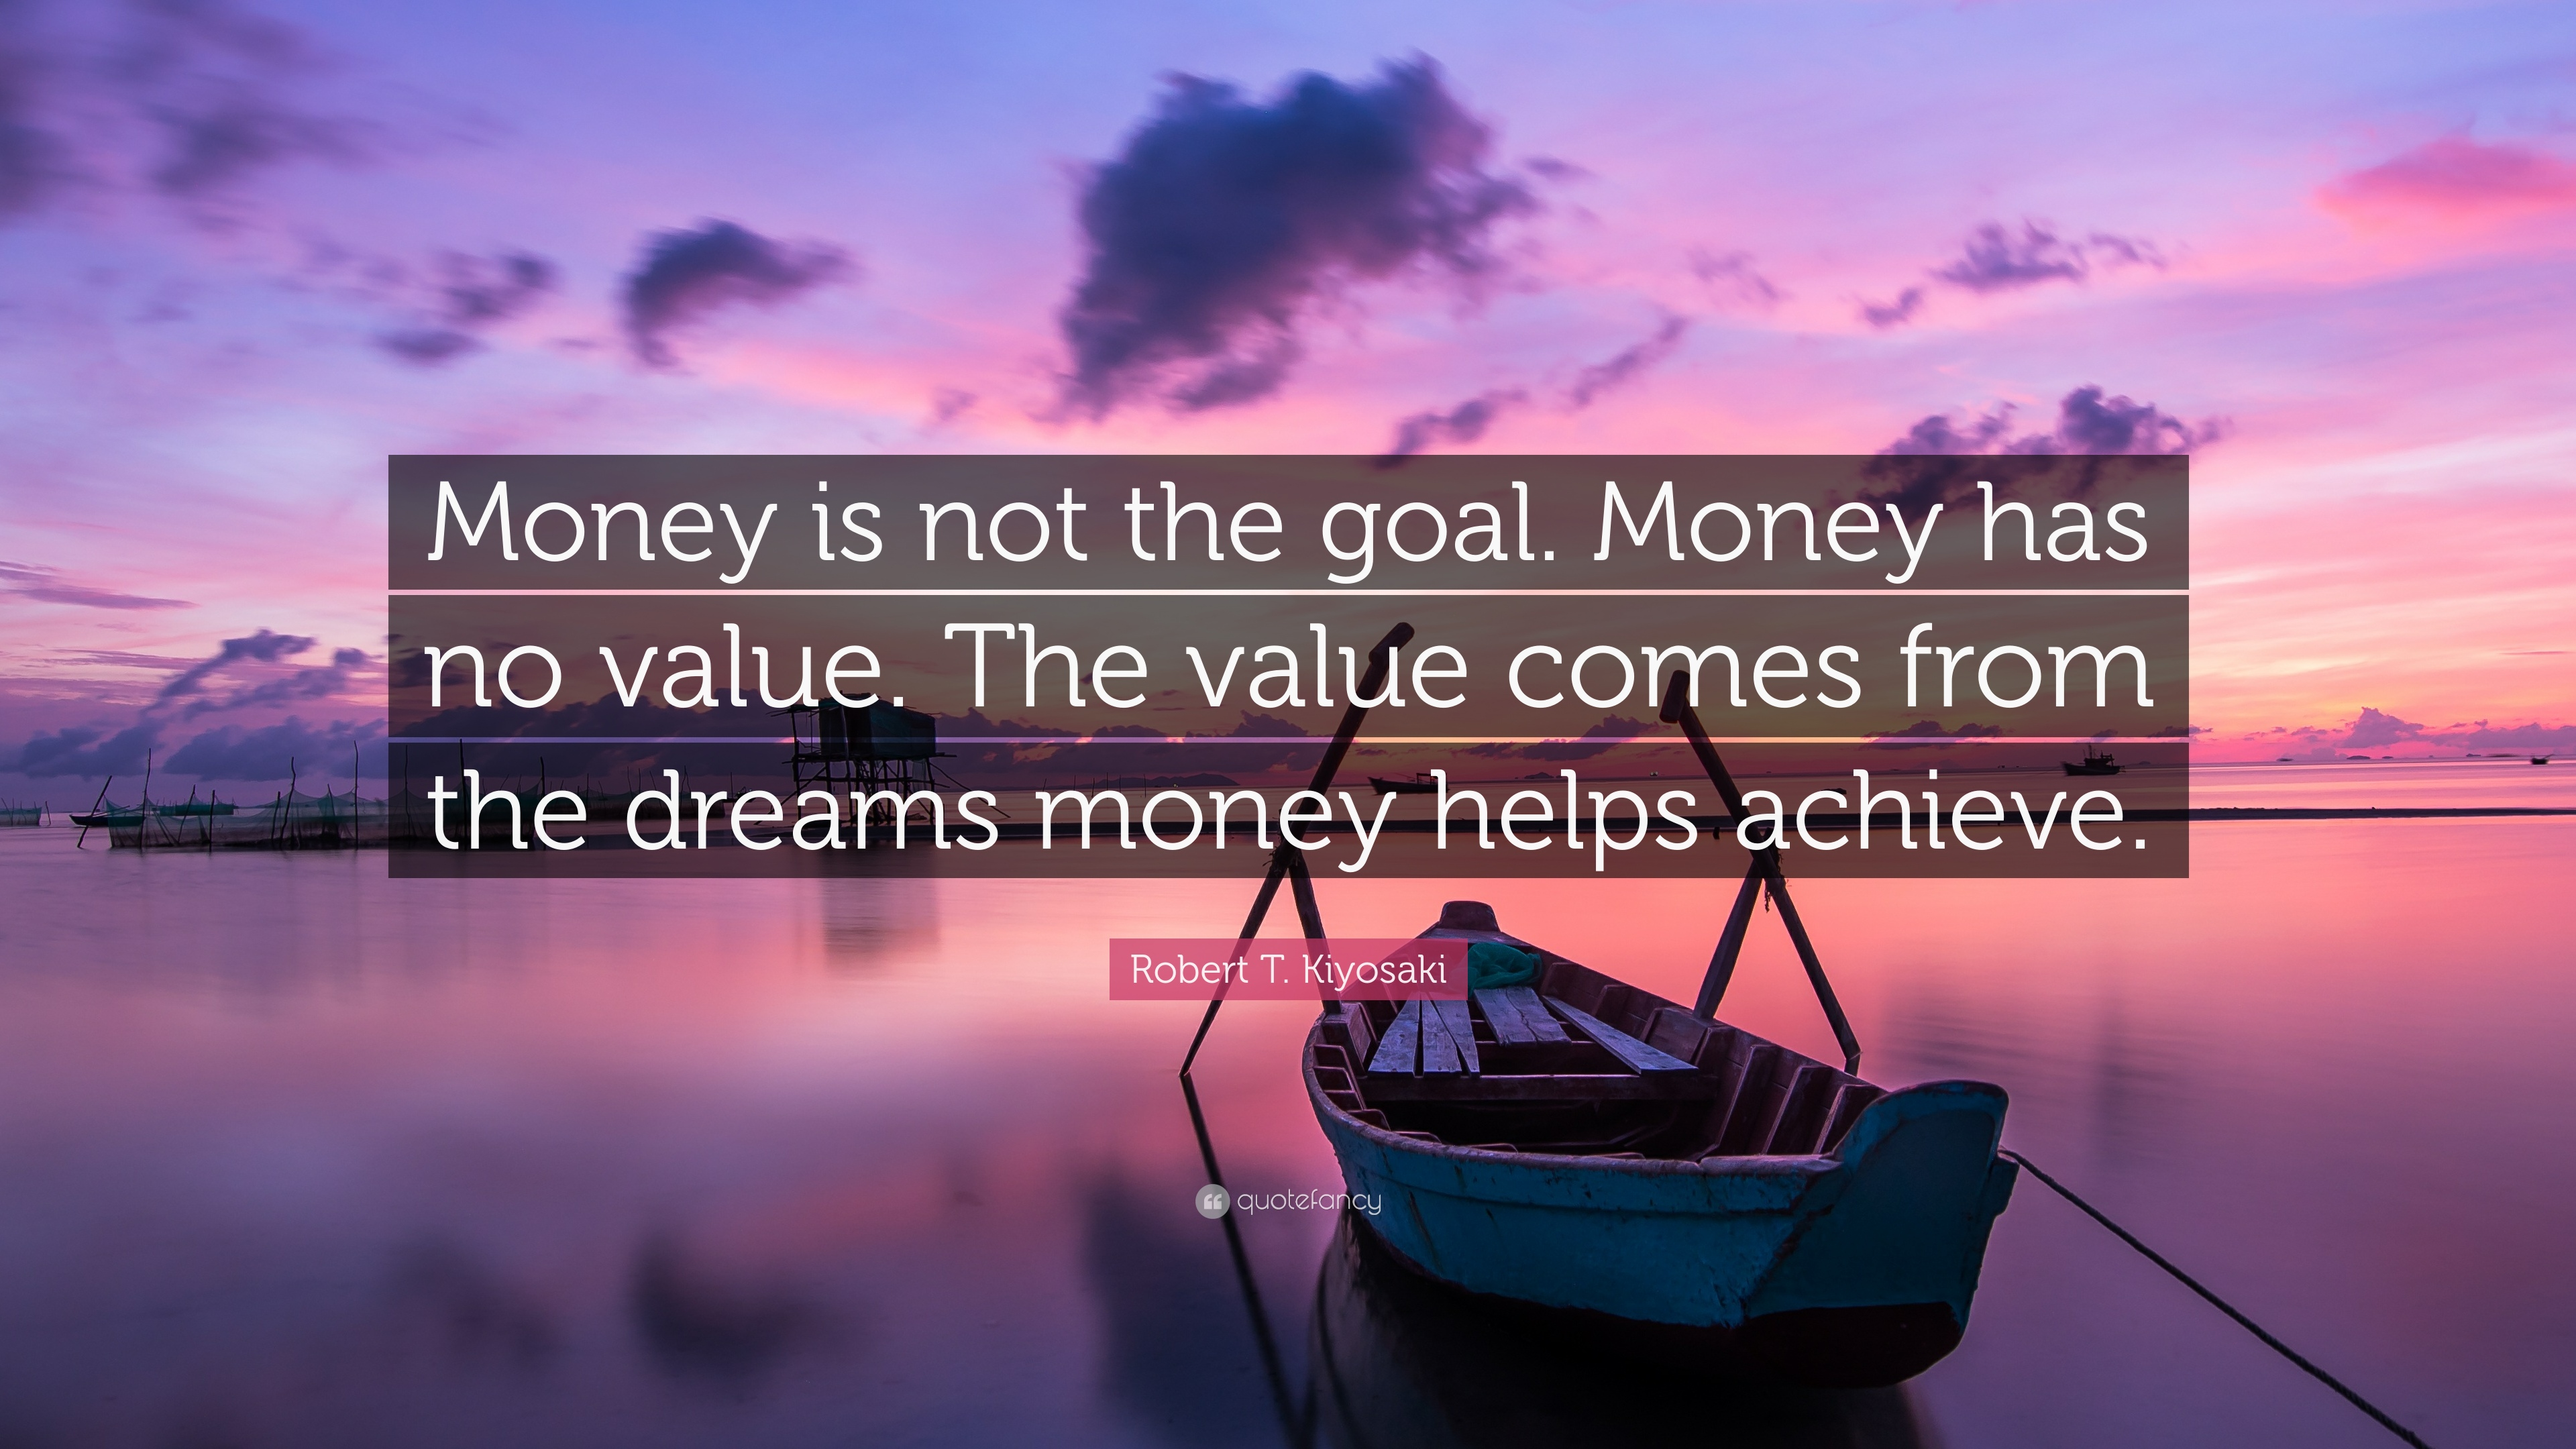 Robert T Kiyosaki Quote Money Is Not The Goal Money Has No Value